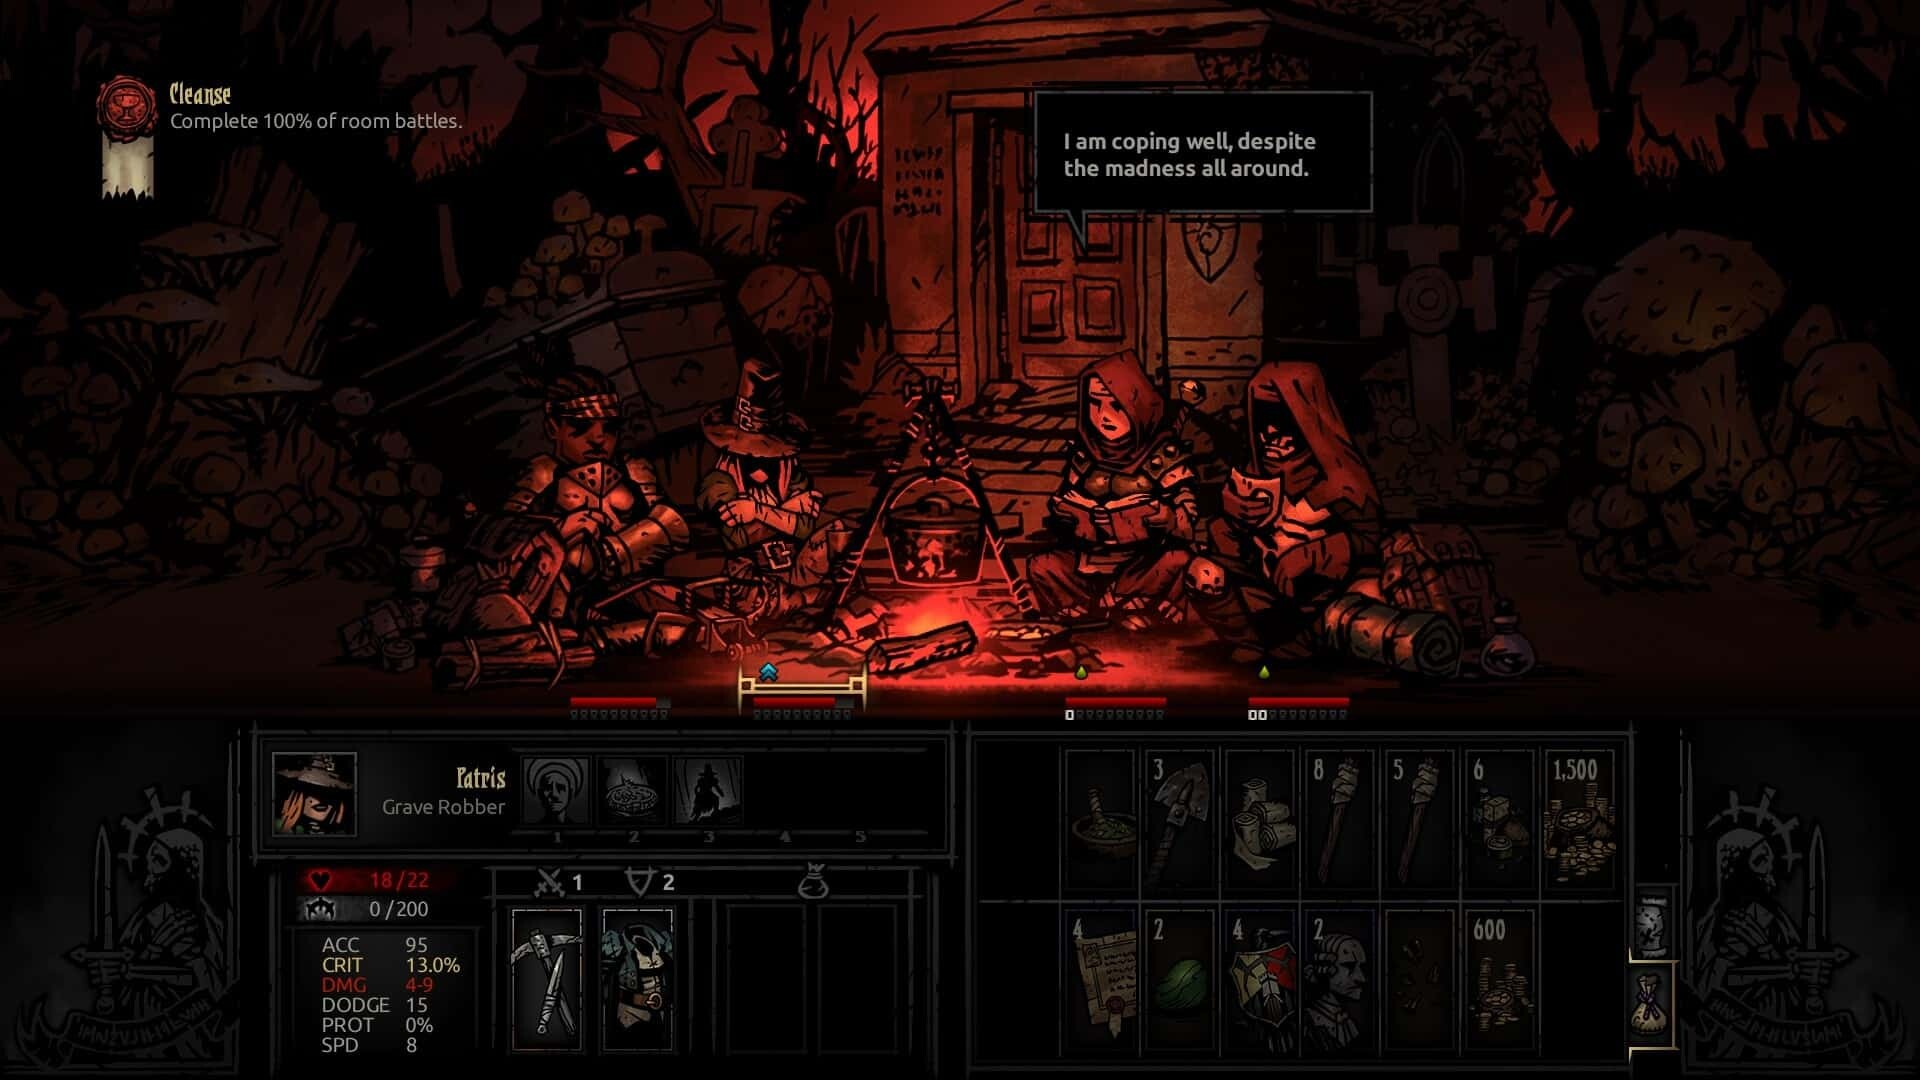 Darkest Dungeon game screenshot, camping